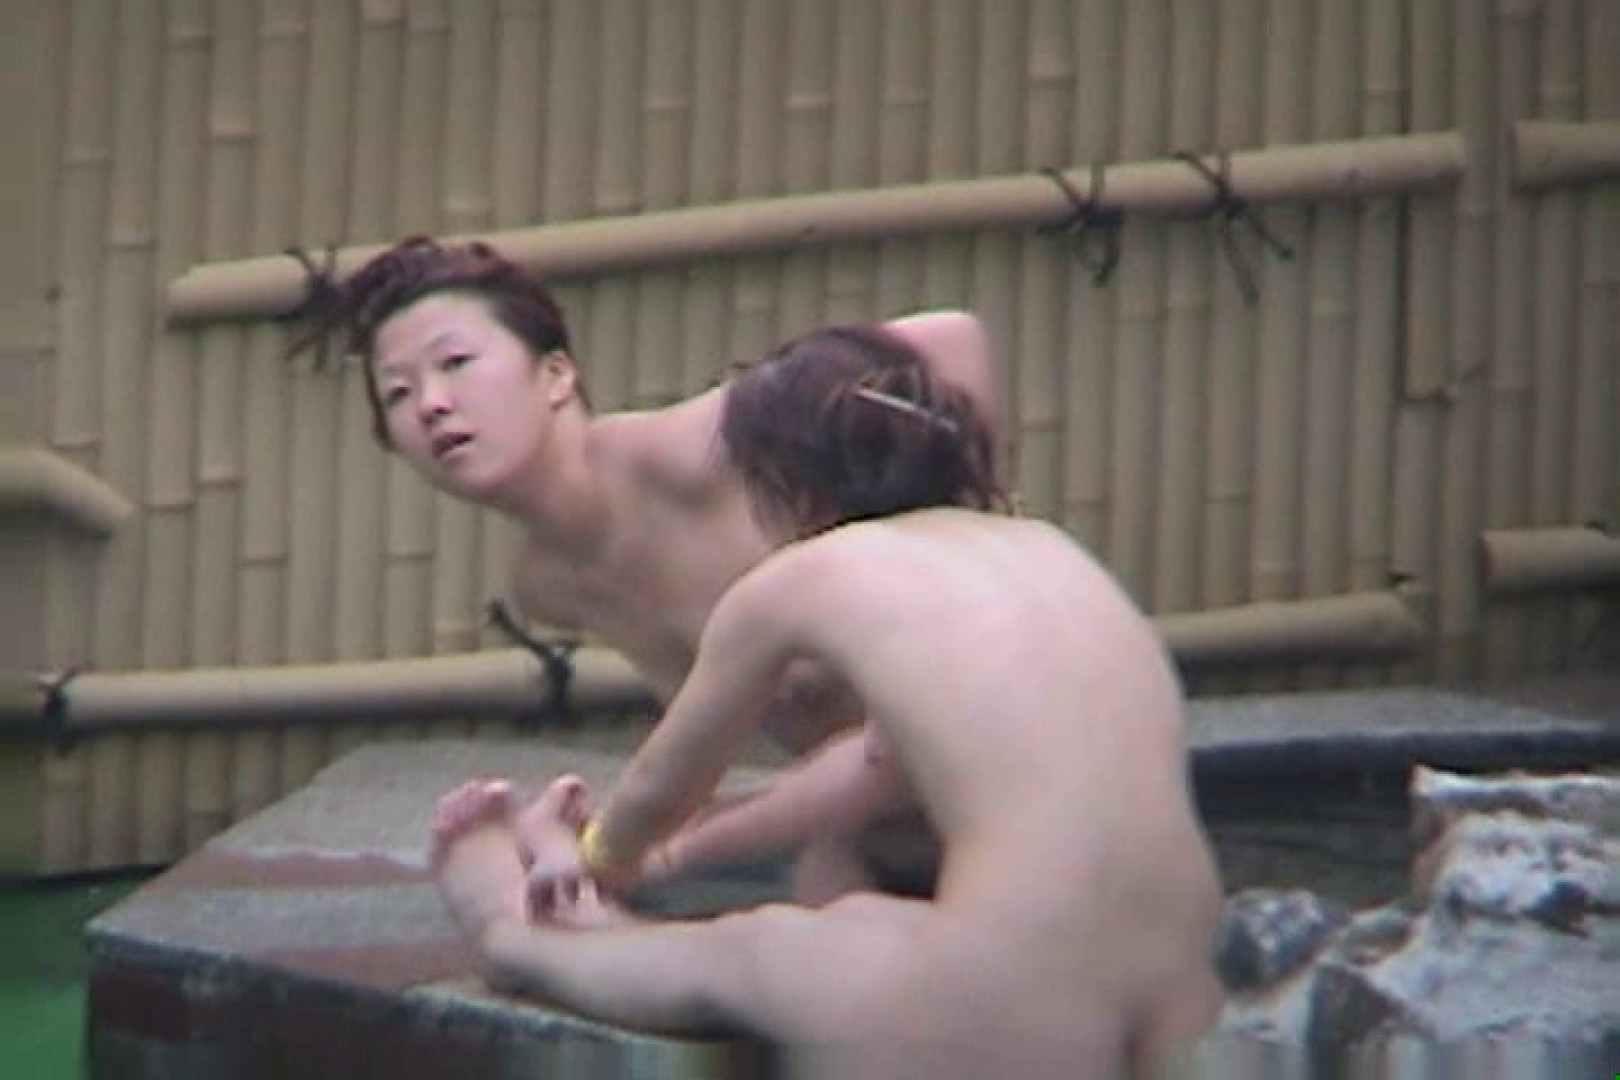 Aquaな露天風呂Vol.600 露天 | HなOL  61pic 10